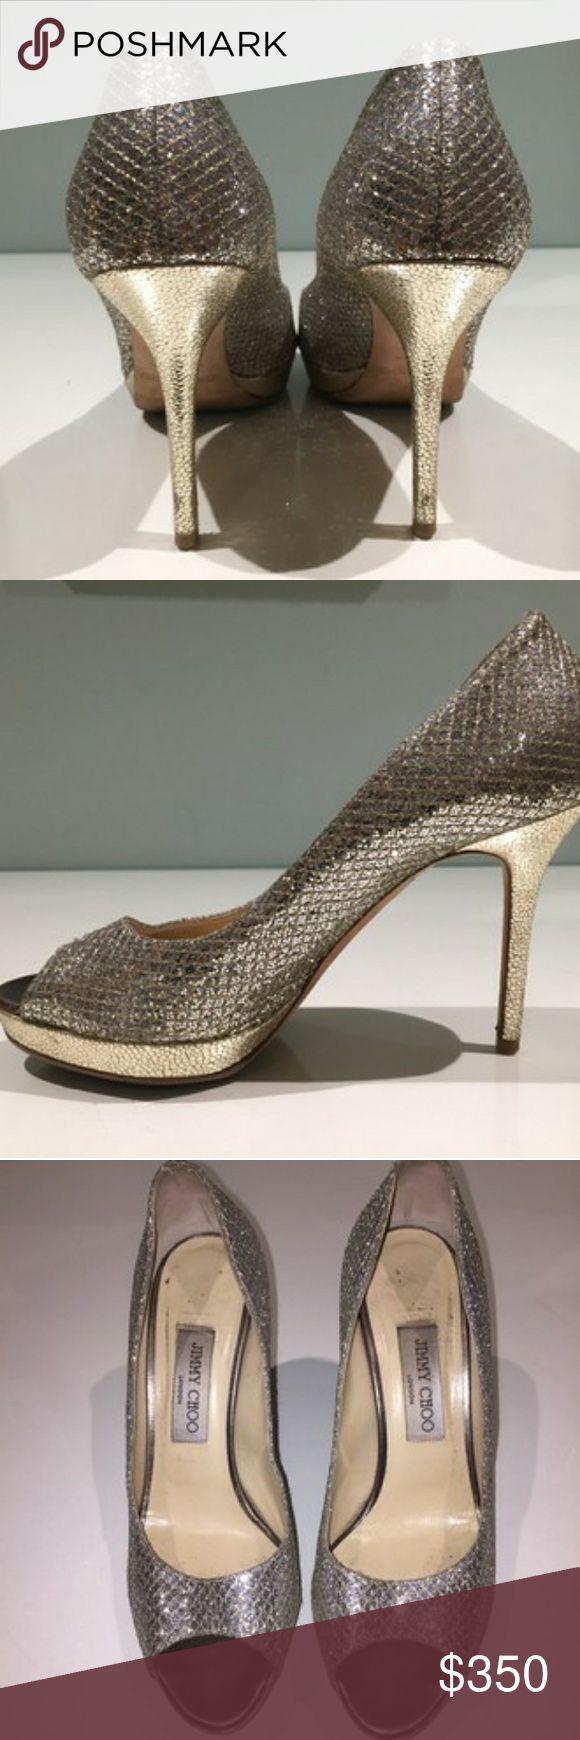 "Jimmy Choo Luna shoe Sparkly fabric & leather upper, leather lining. Peep toe platform. 4"" heel, 3/4"" platform, 100mm pitch. Size 8.5 or 38.5 Euro. Jimmy Choo Shoes Sandals"